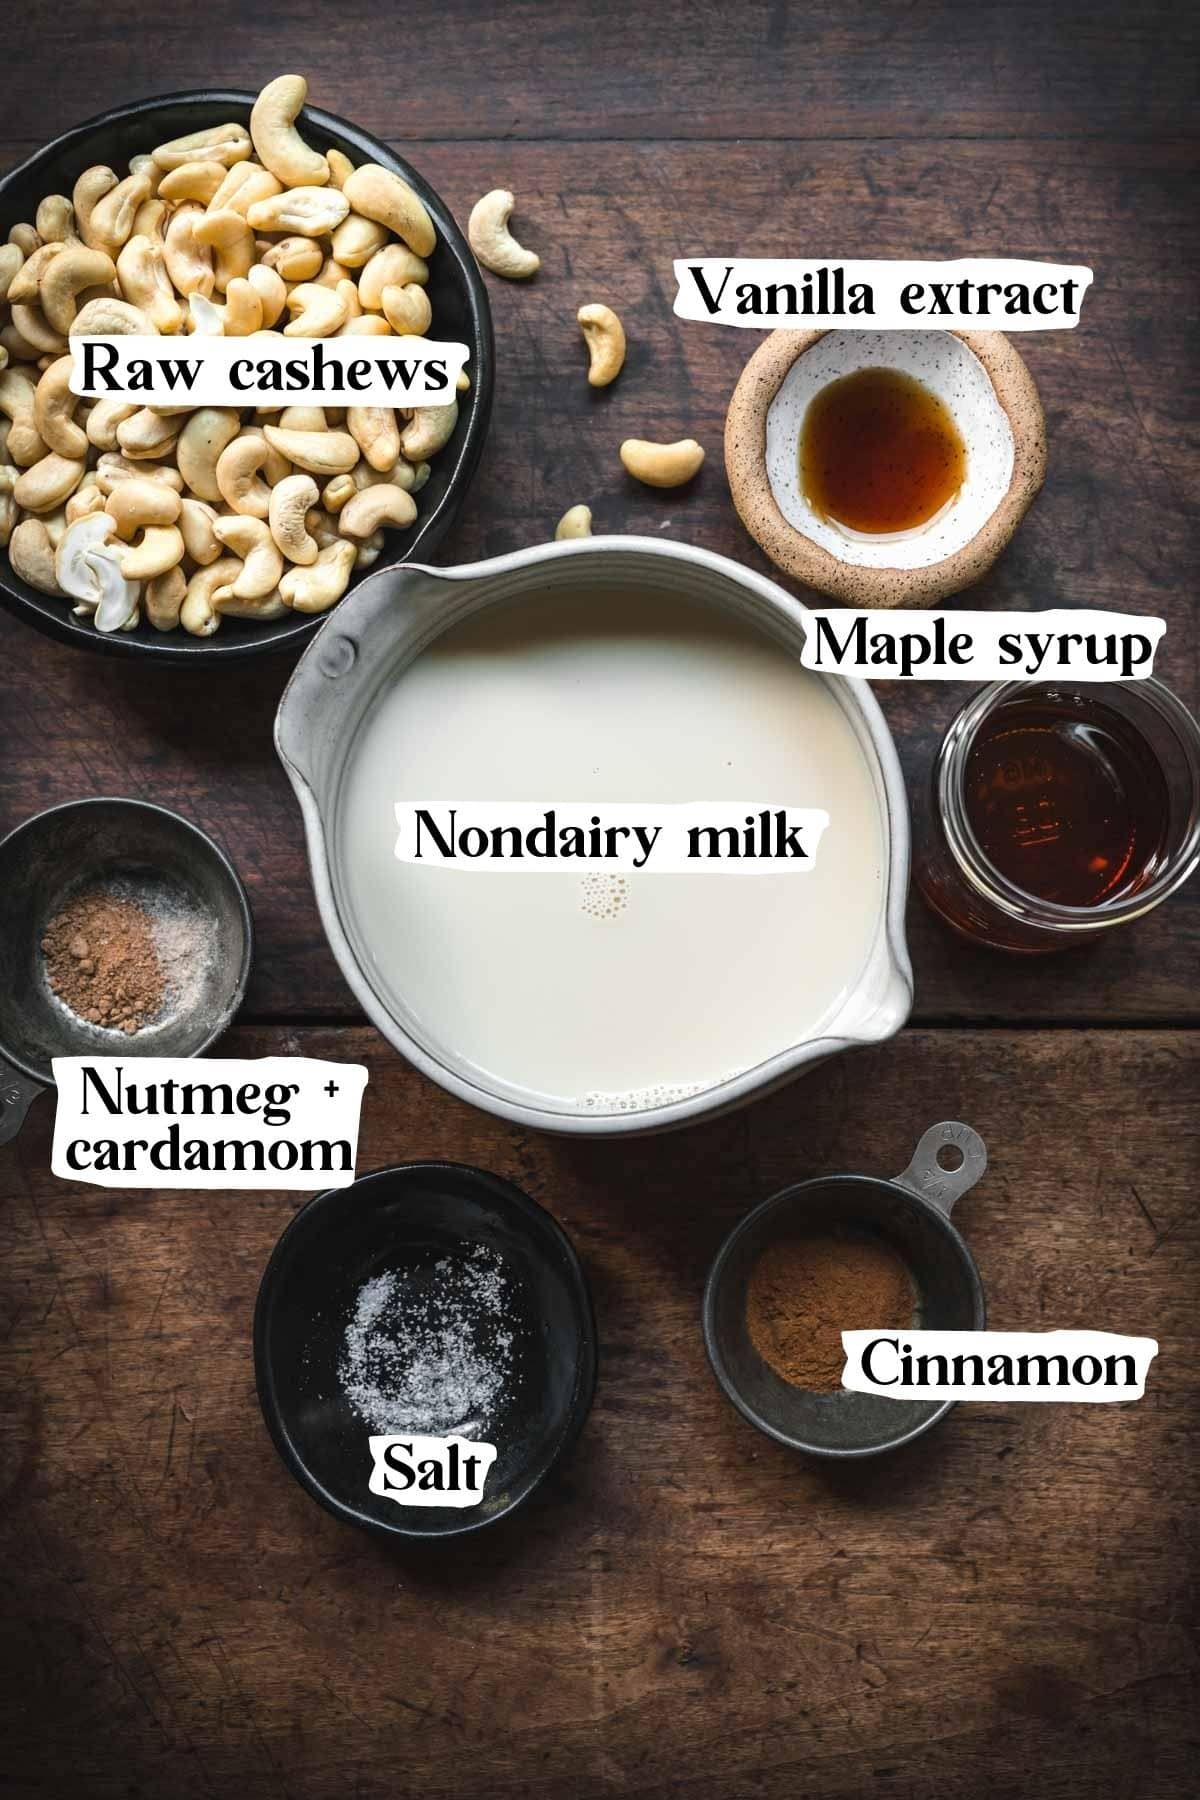 Overhead view of vegan eggnog ingredients, including cashews, vanilla extract, milk, maple, nutmeg, salt and cinnamon.